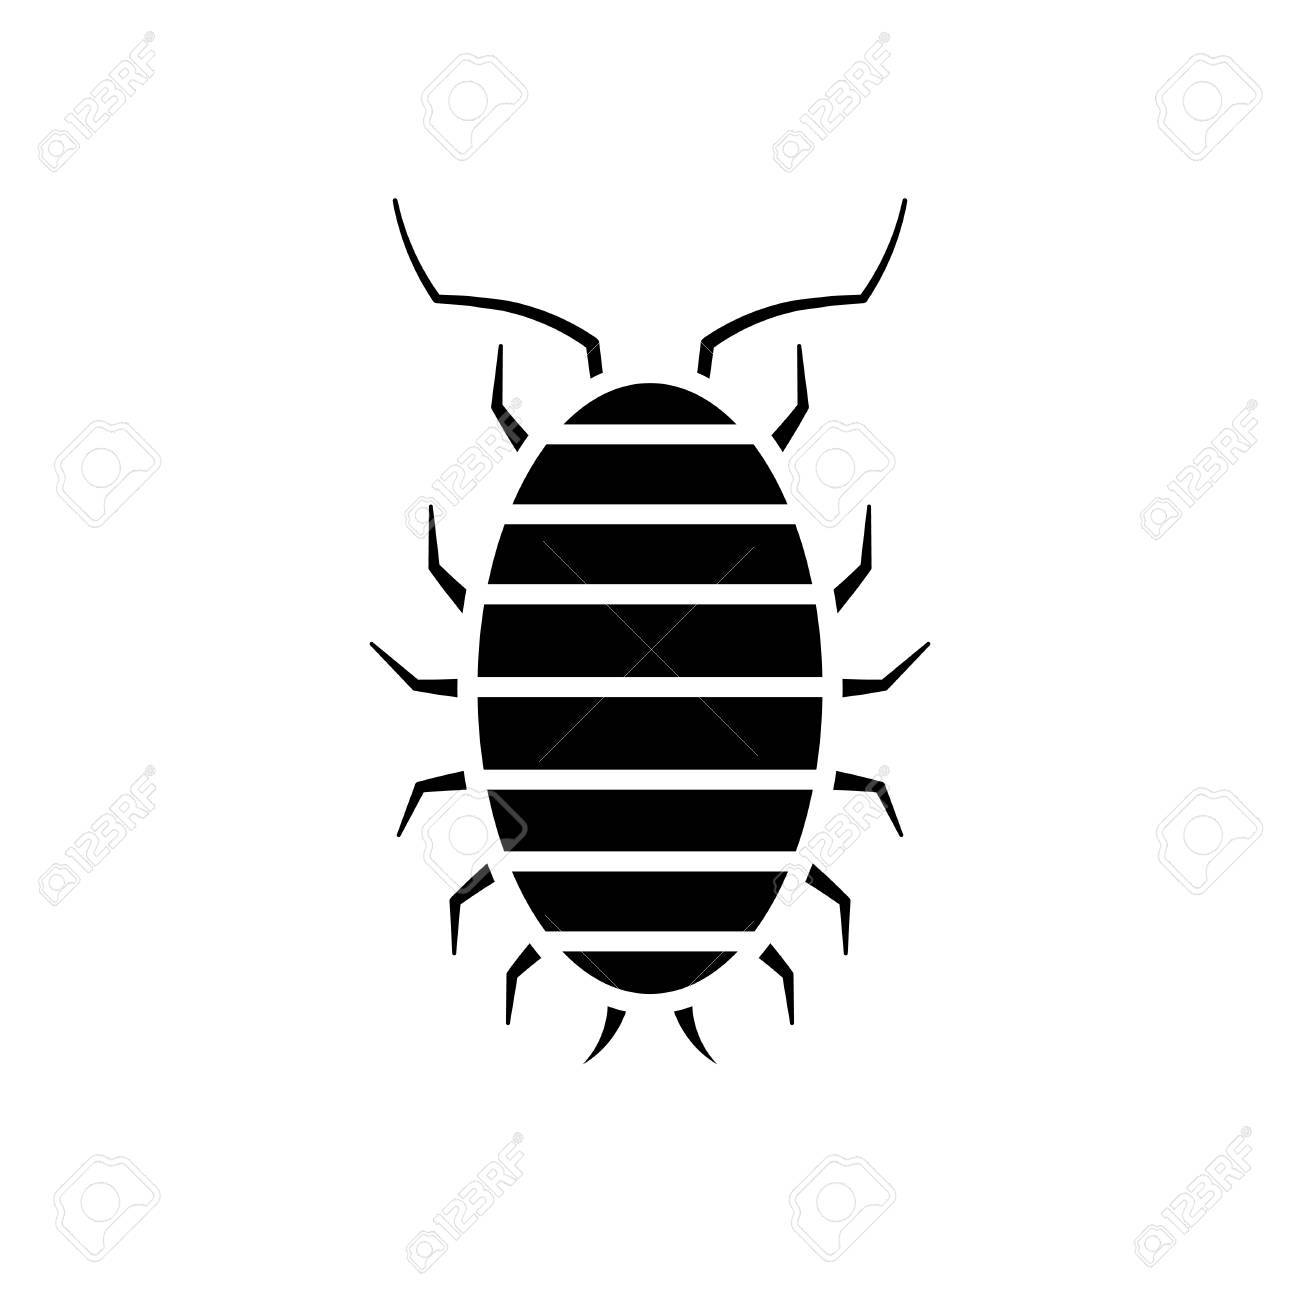 Termit Icon. Pest Control Clipart Isolated On White Background Lizenzfrei  Nutzbare Vektorgrafiken, Clip Arts, Illustrationen. Image 115065874.